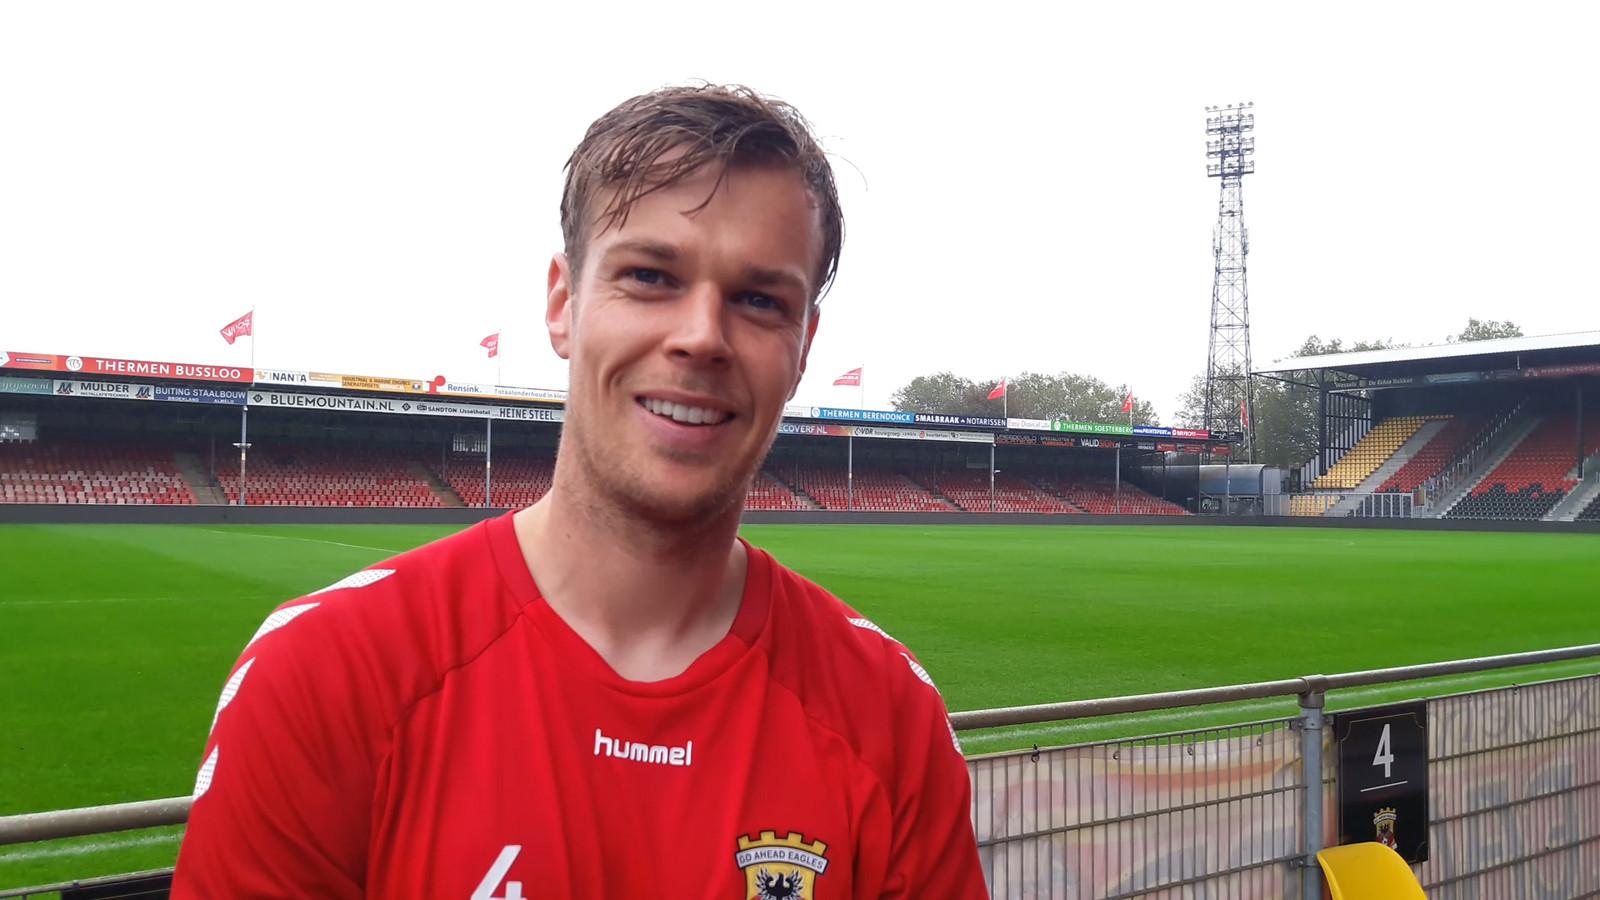 Jeroen Veldmate